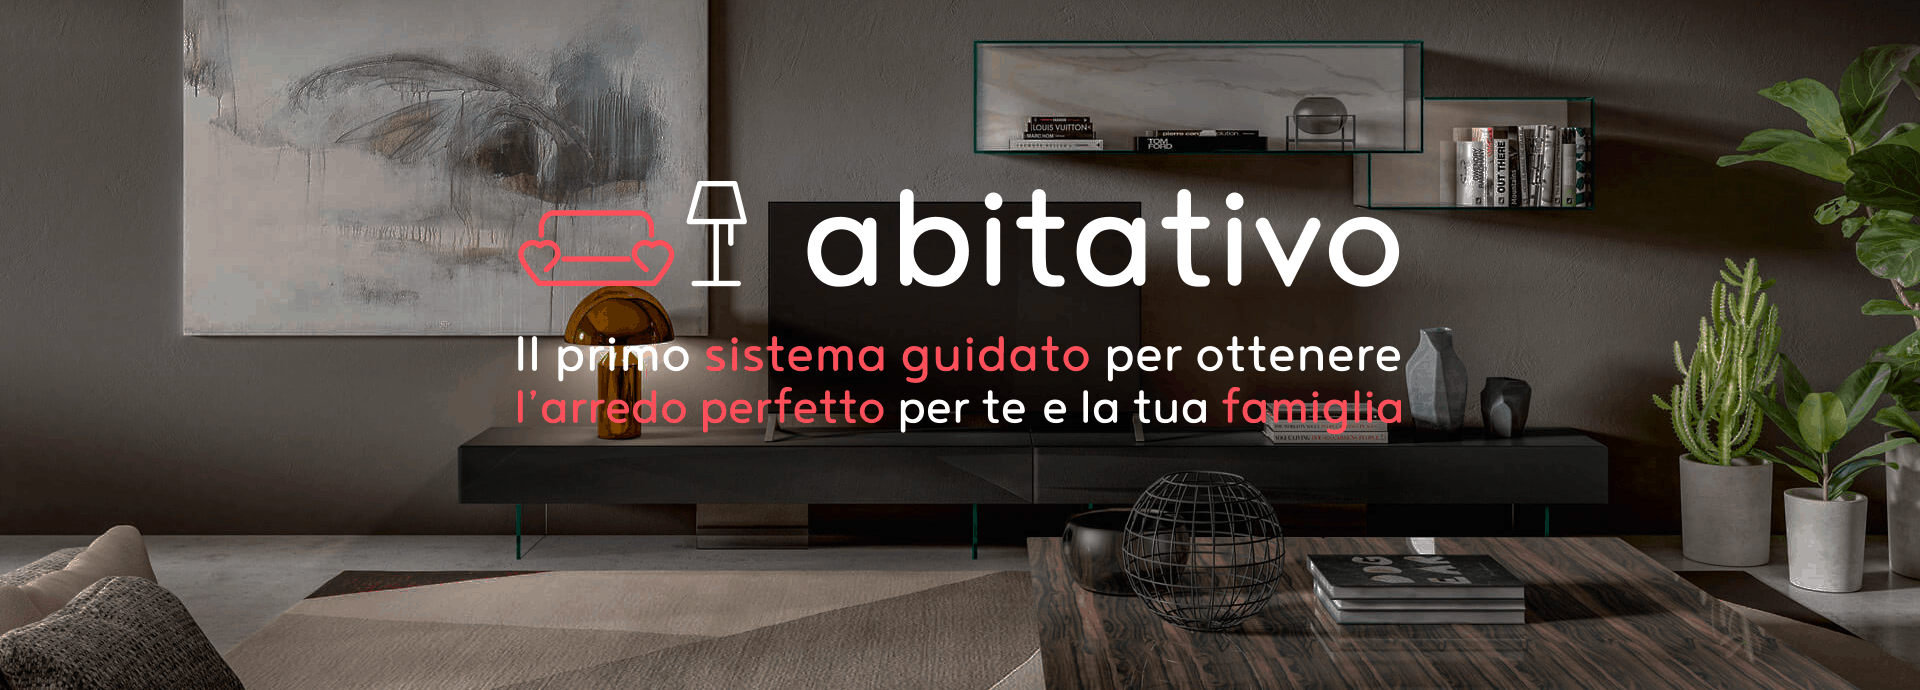 Abitativo - Metodo Abitativo D'Amico Arreda